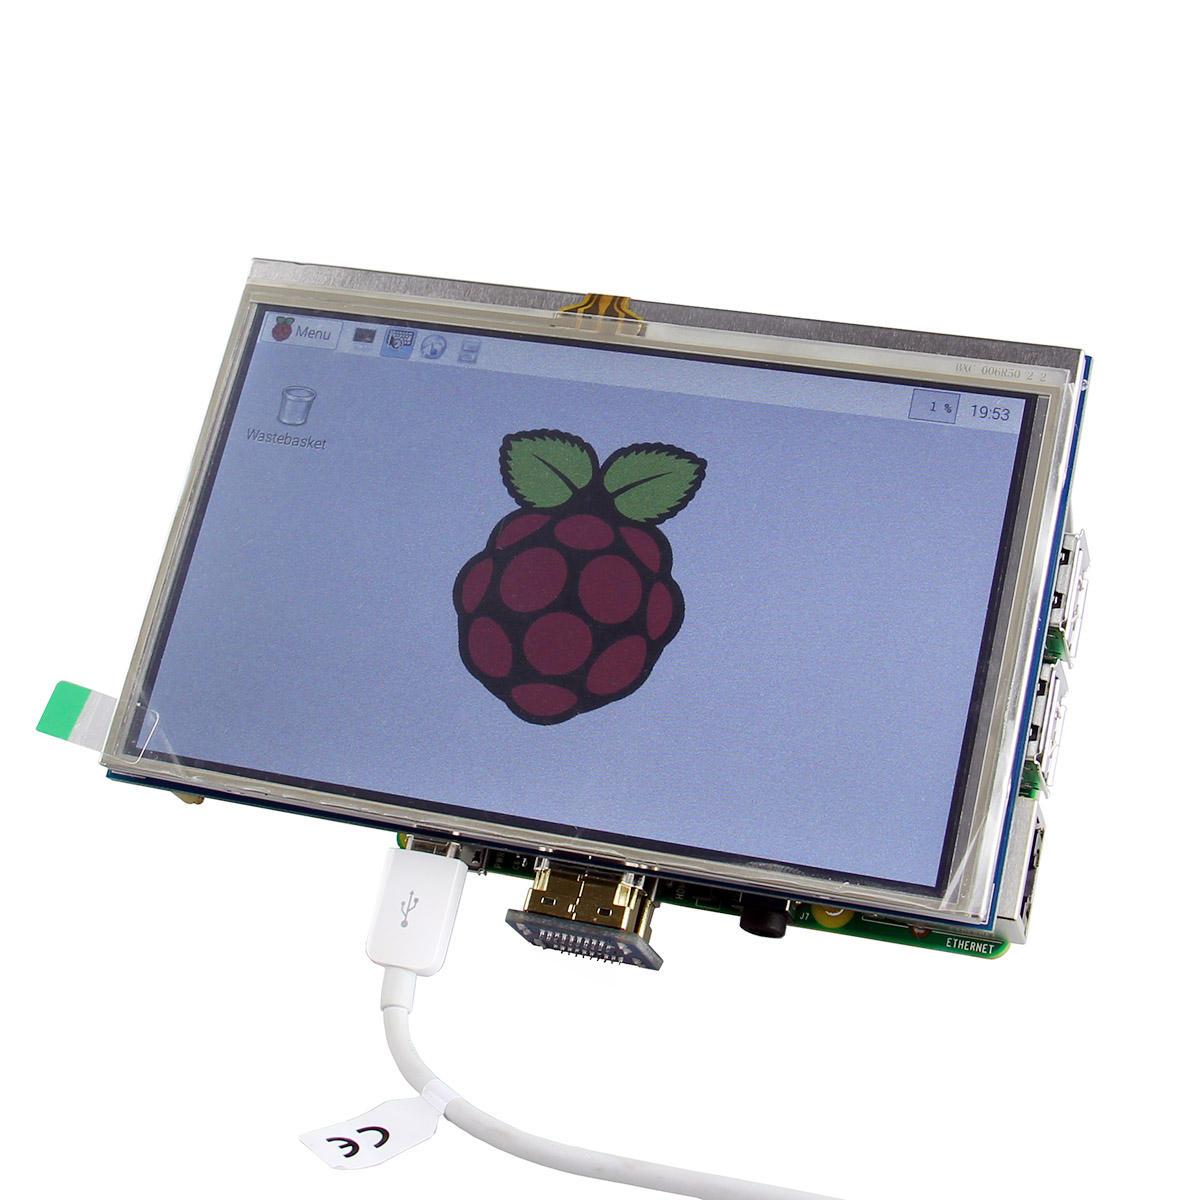 5 Inch HD TFT LCD Touch Screen For Raspberry PI 2 Model B / B+ / A+ / B